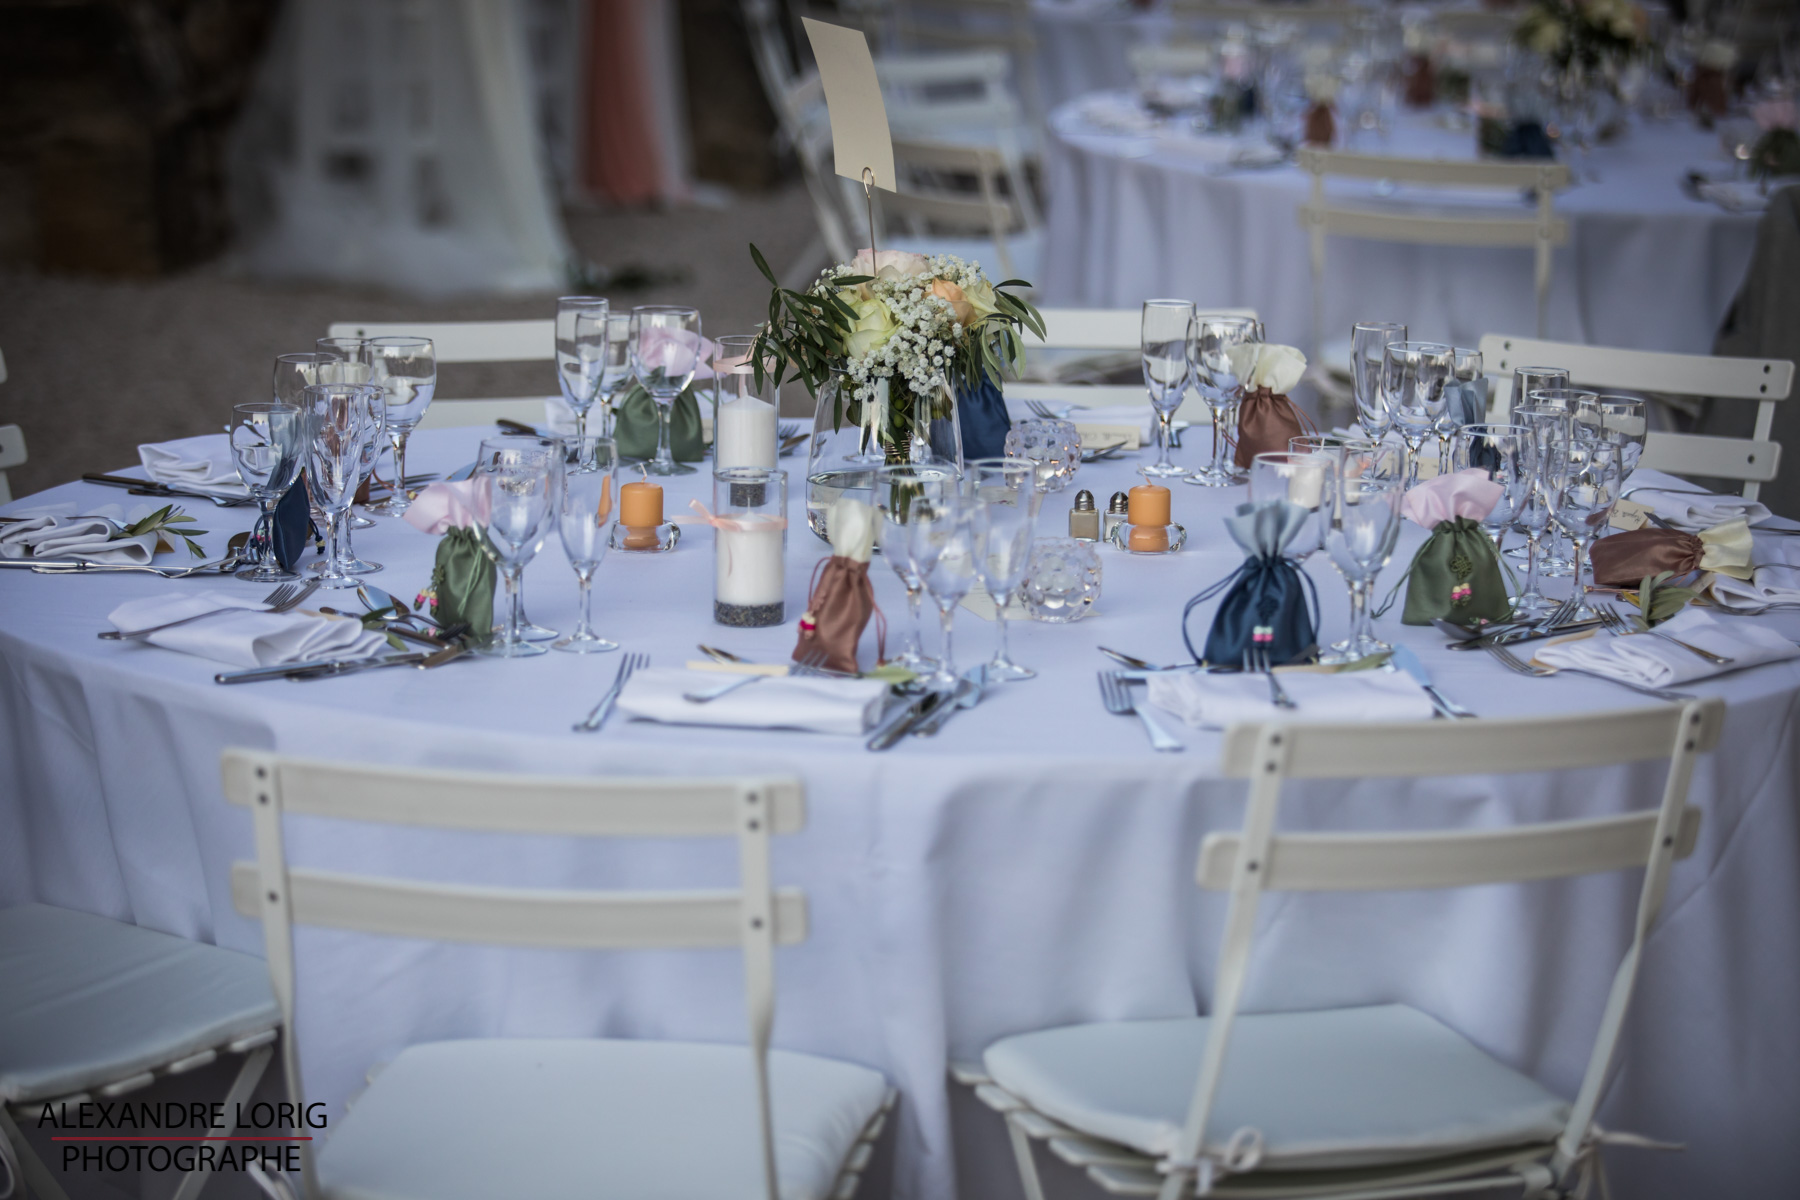 le coeur dans les etoiles - wedding planner provence - luberon - mariage provence - Alexandre Lorig - deco table